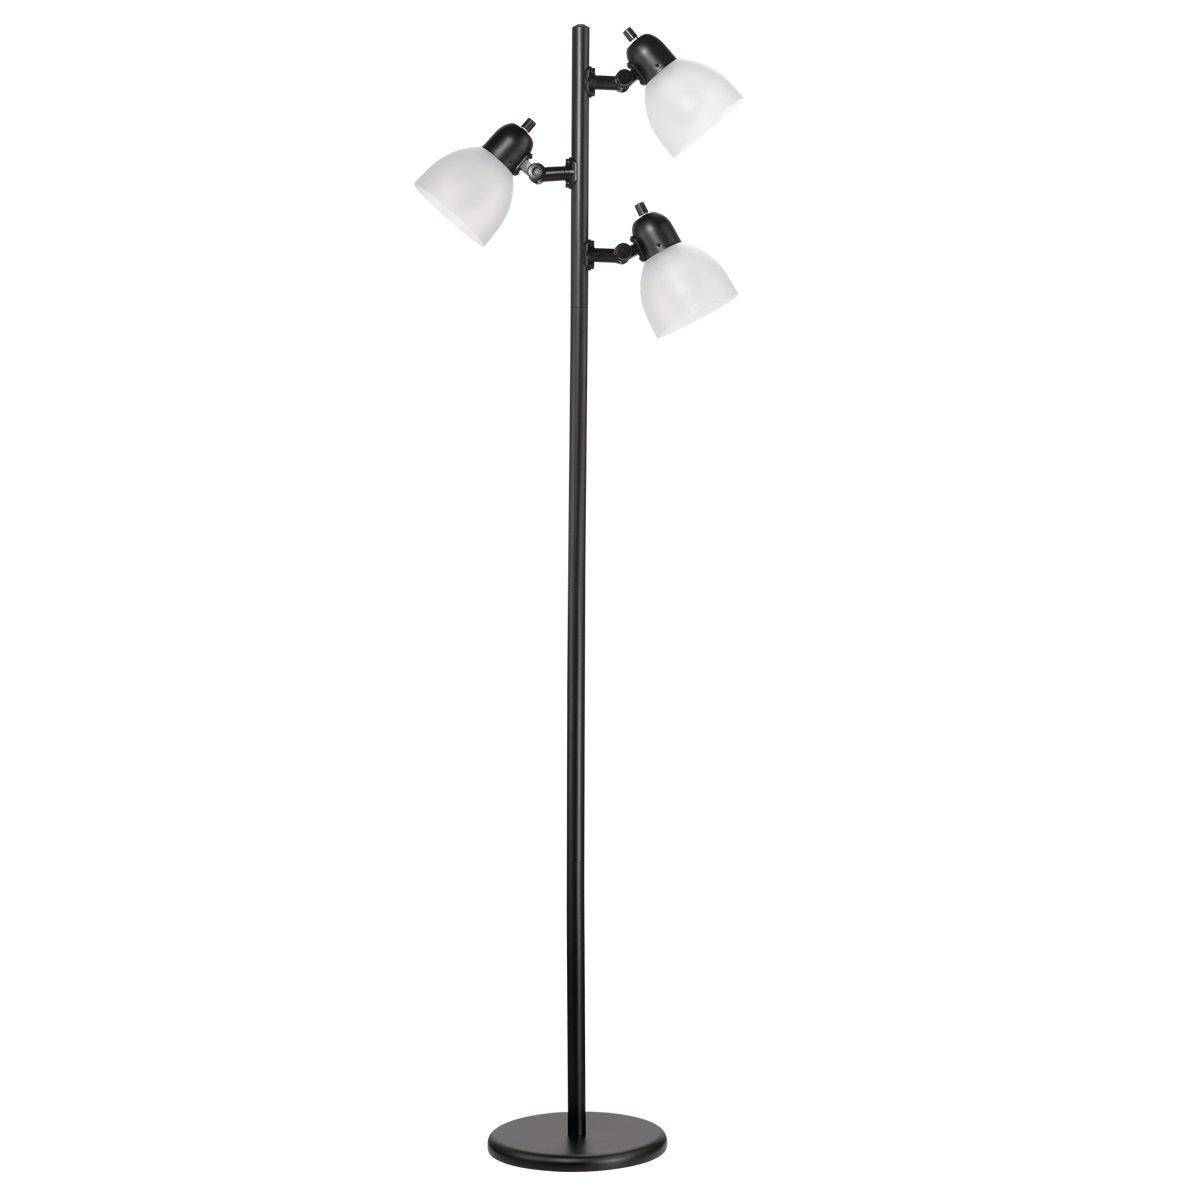 Novogratz 63'' 3-Light LED Floor Lamp, Matte Black Finish, Frosted Plastic Shades, Black Cord with Polarized Plug, LED Bulbs Included, 12719